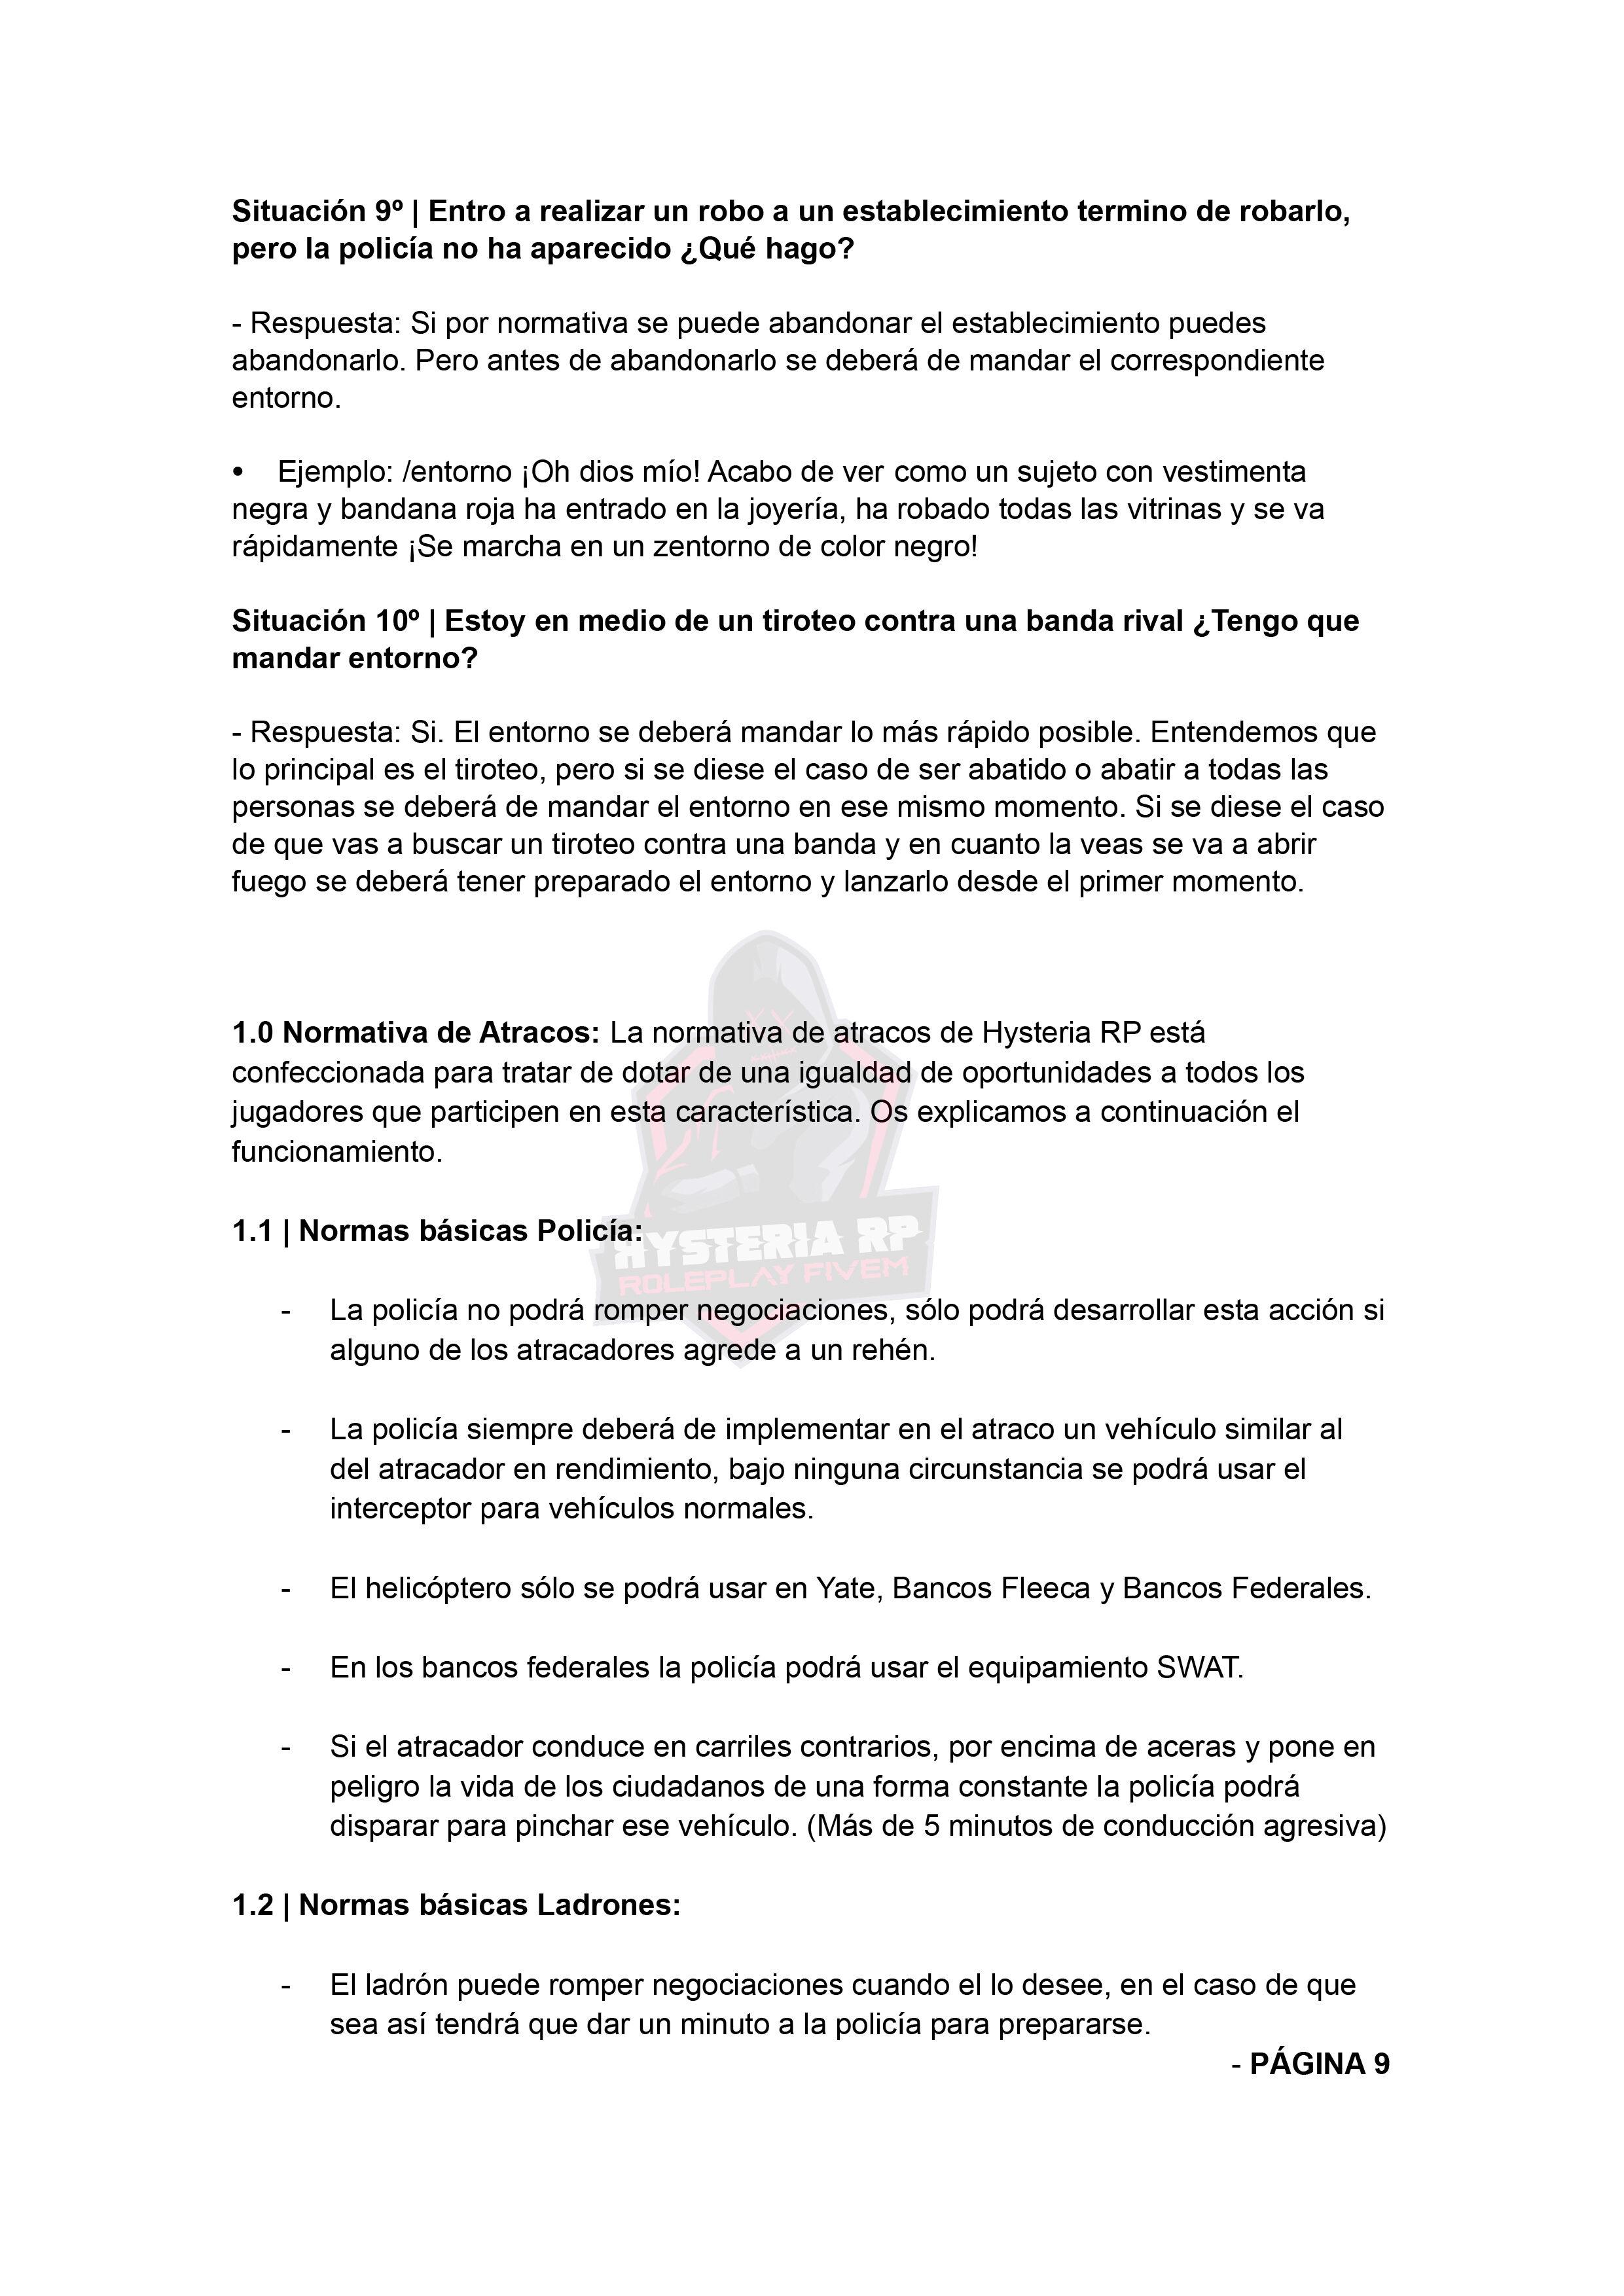 Normativa de Bandas | Hysteria RP Normat32